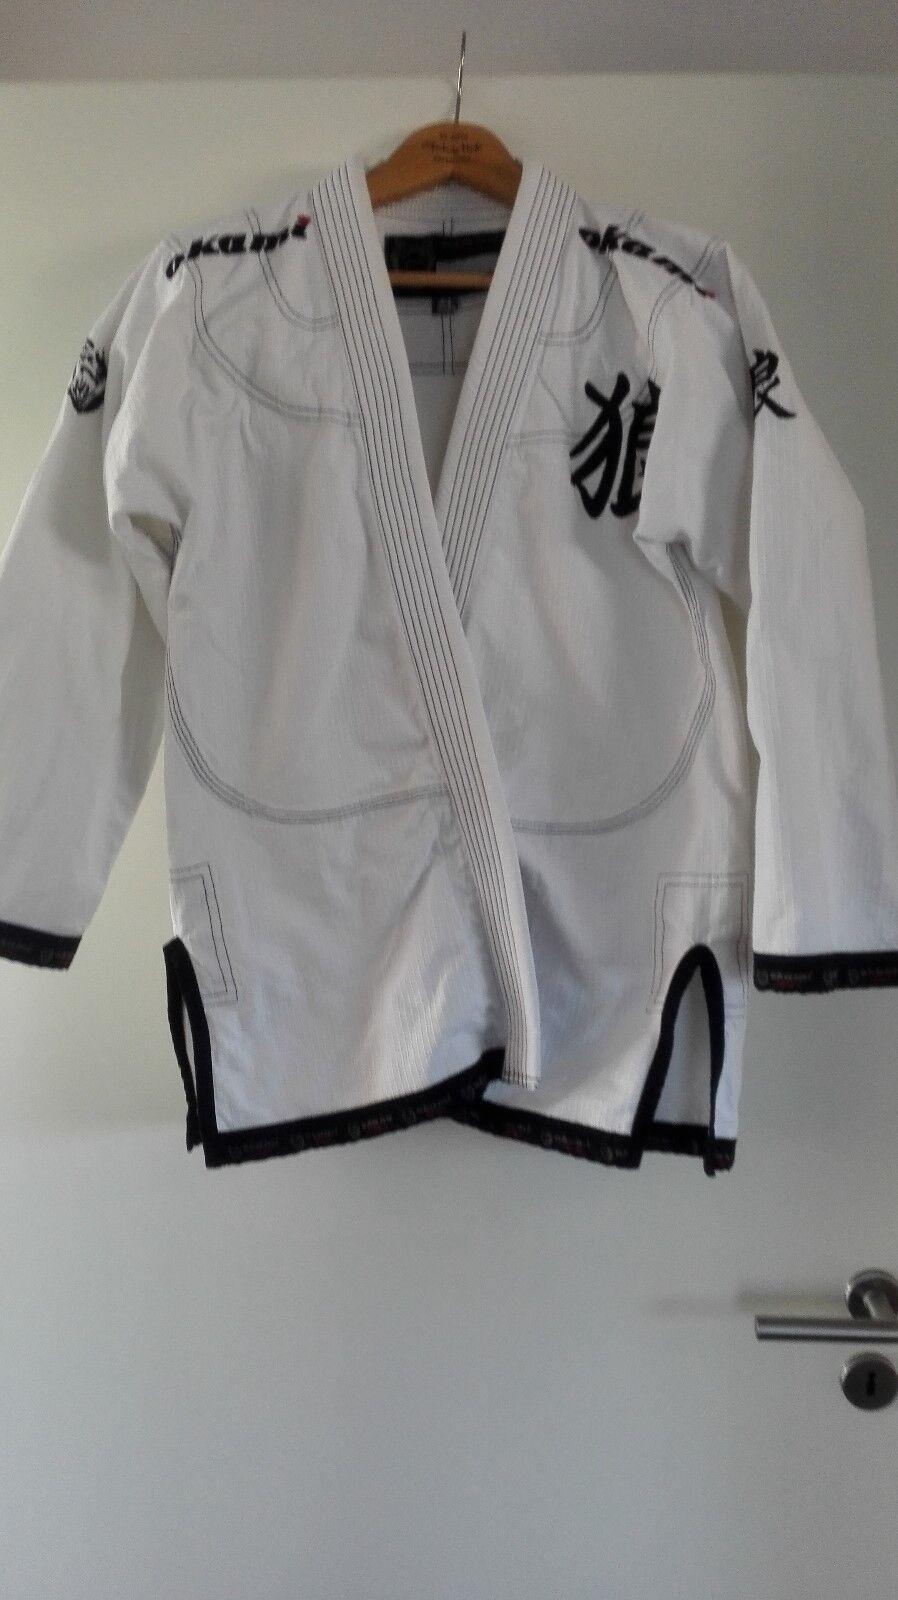 Okami Fightgear  Gi - Jiu Jitsu Jitsu Jitsu  Anzug Kimono weiß Herren Größe A3 - neuwertig  | Genialität  | Fairer Preis  | Am wirtschaftlichsten  7ff28a